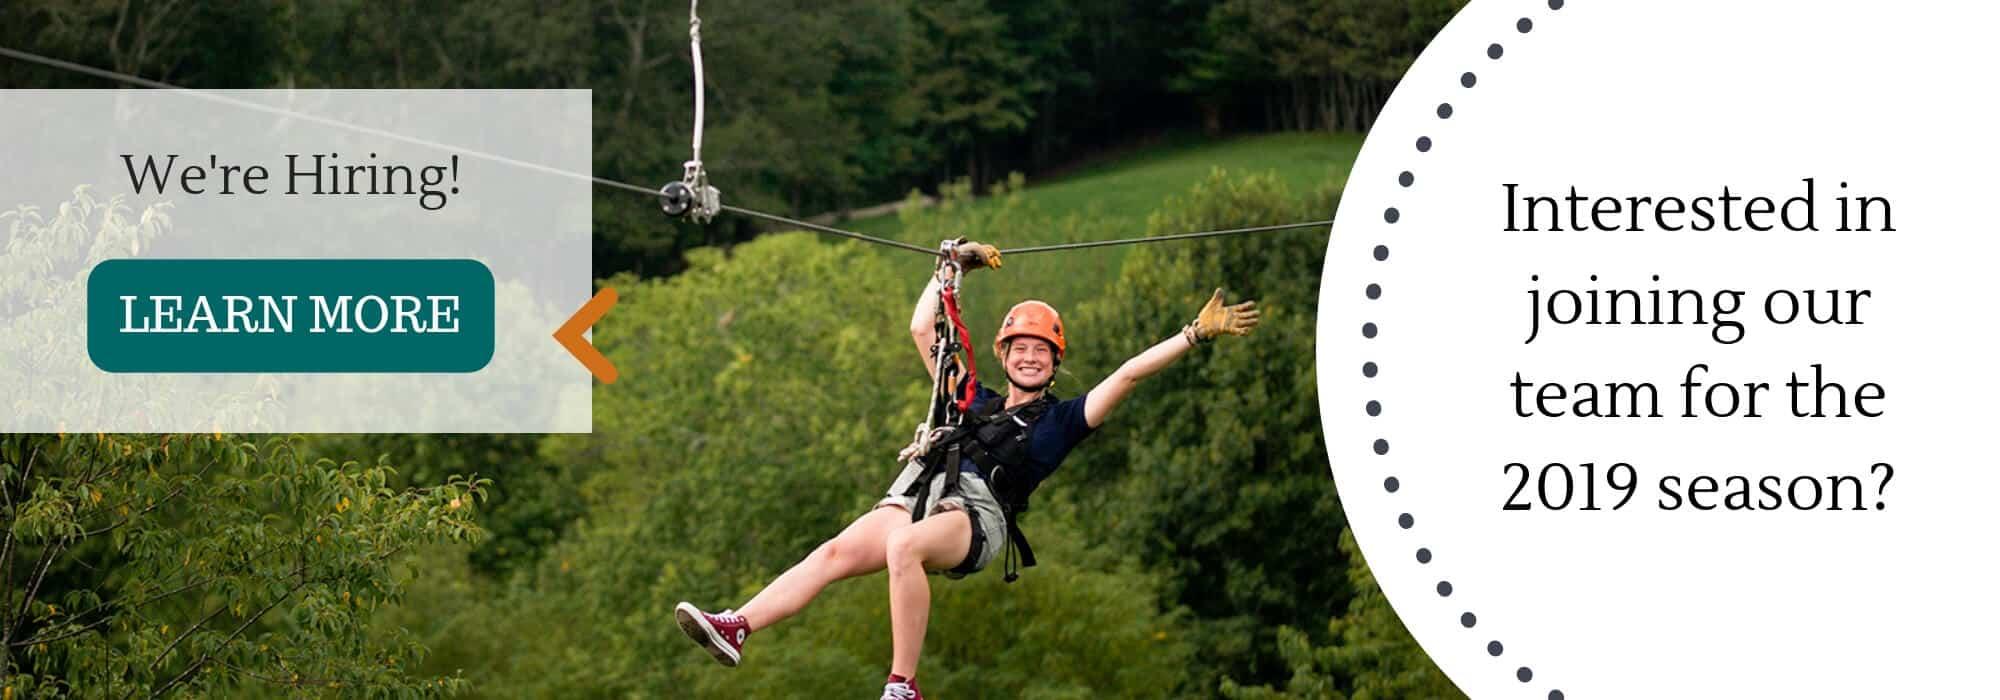 hiring-2019-high-gravity-adventures-home-banner